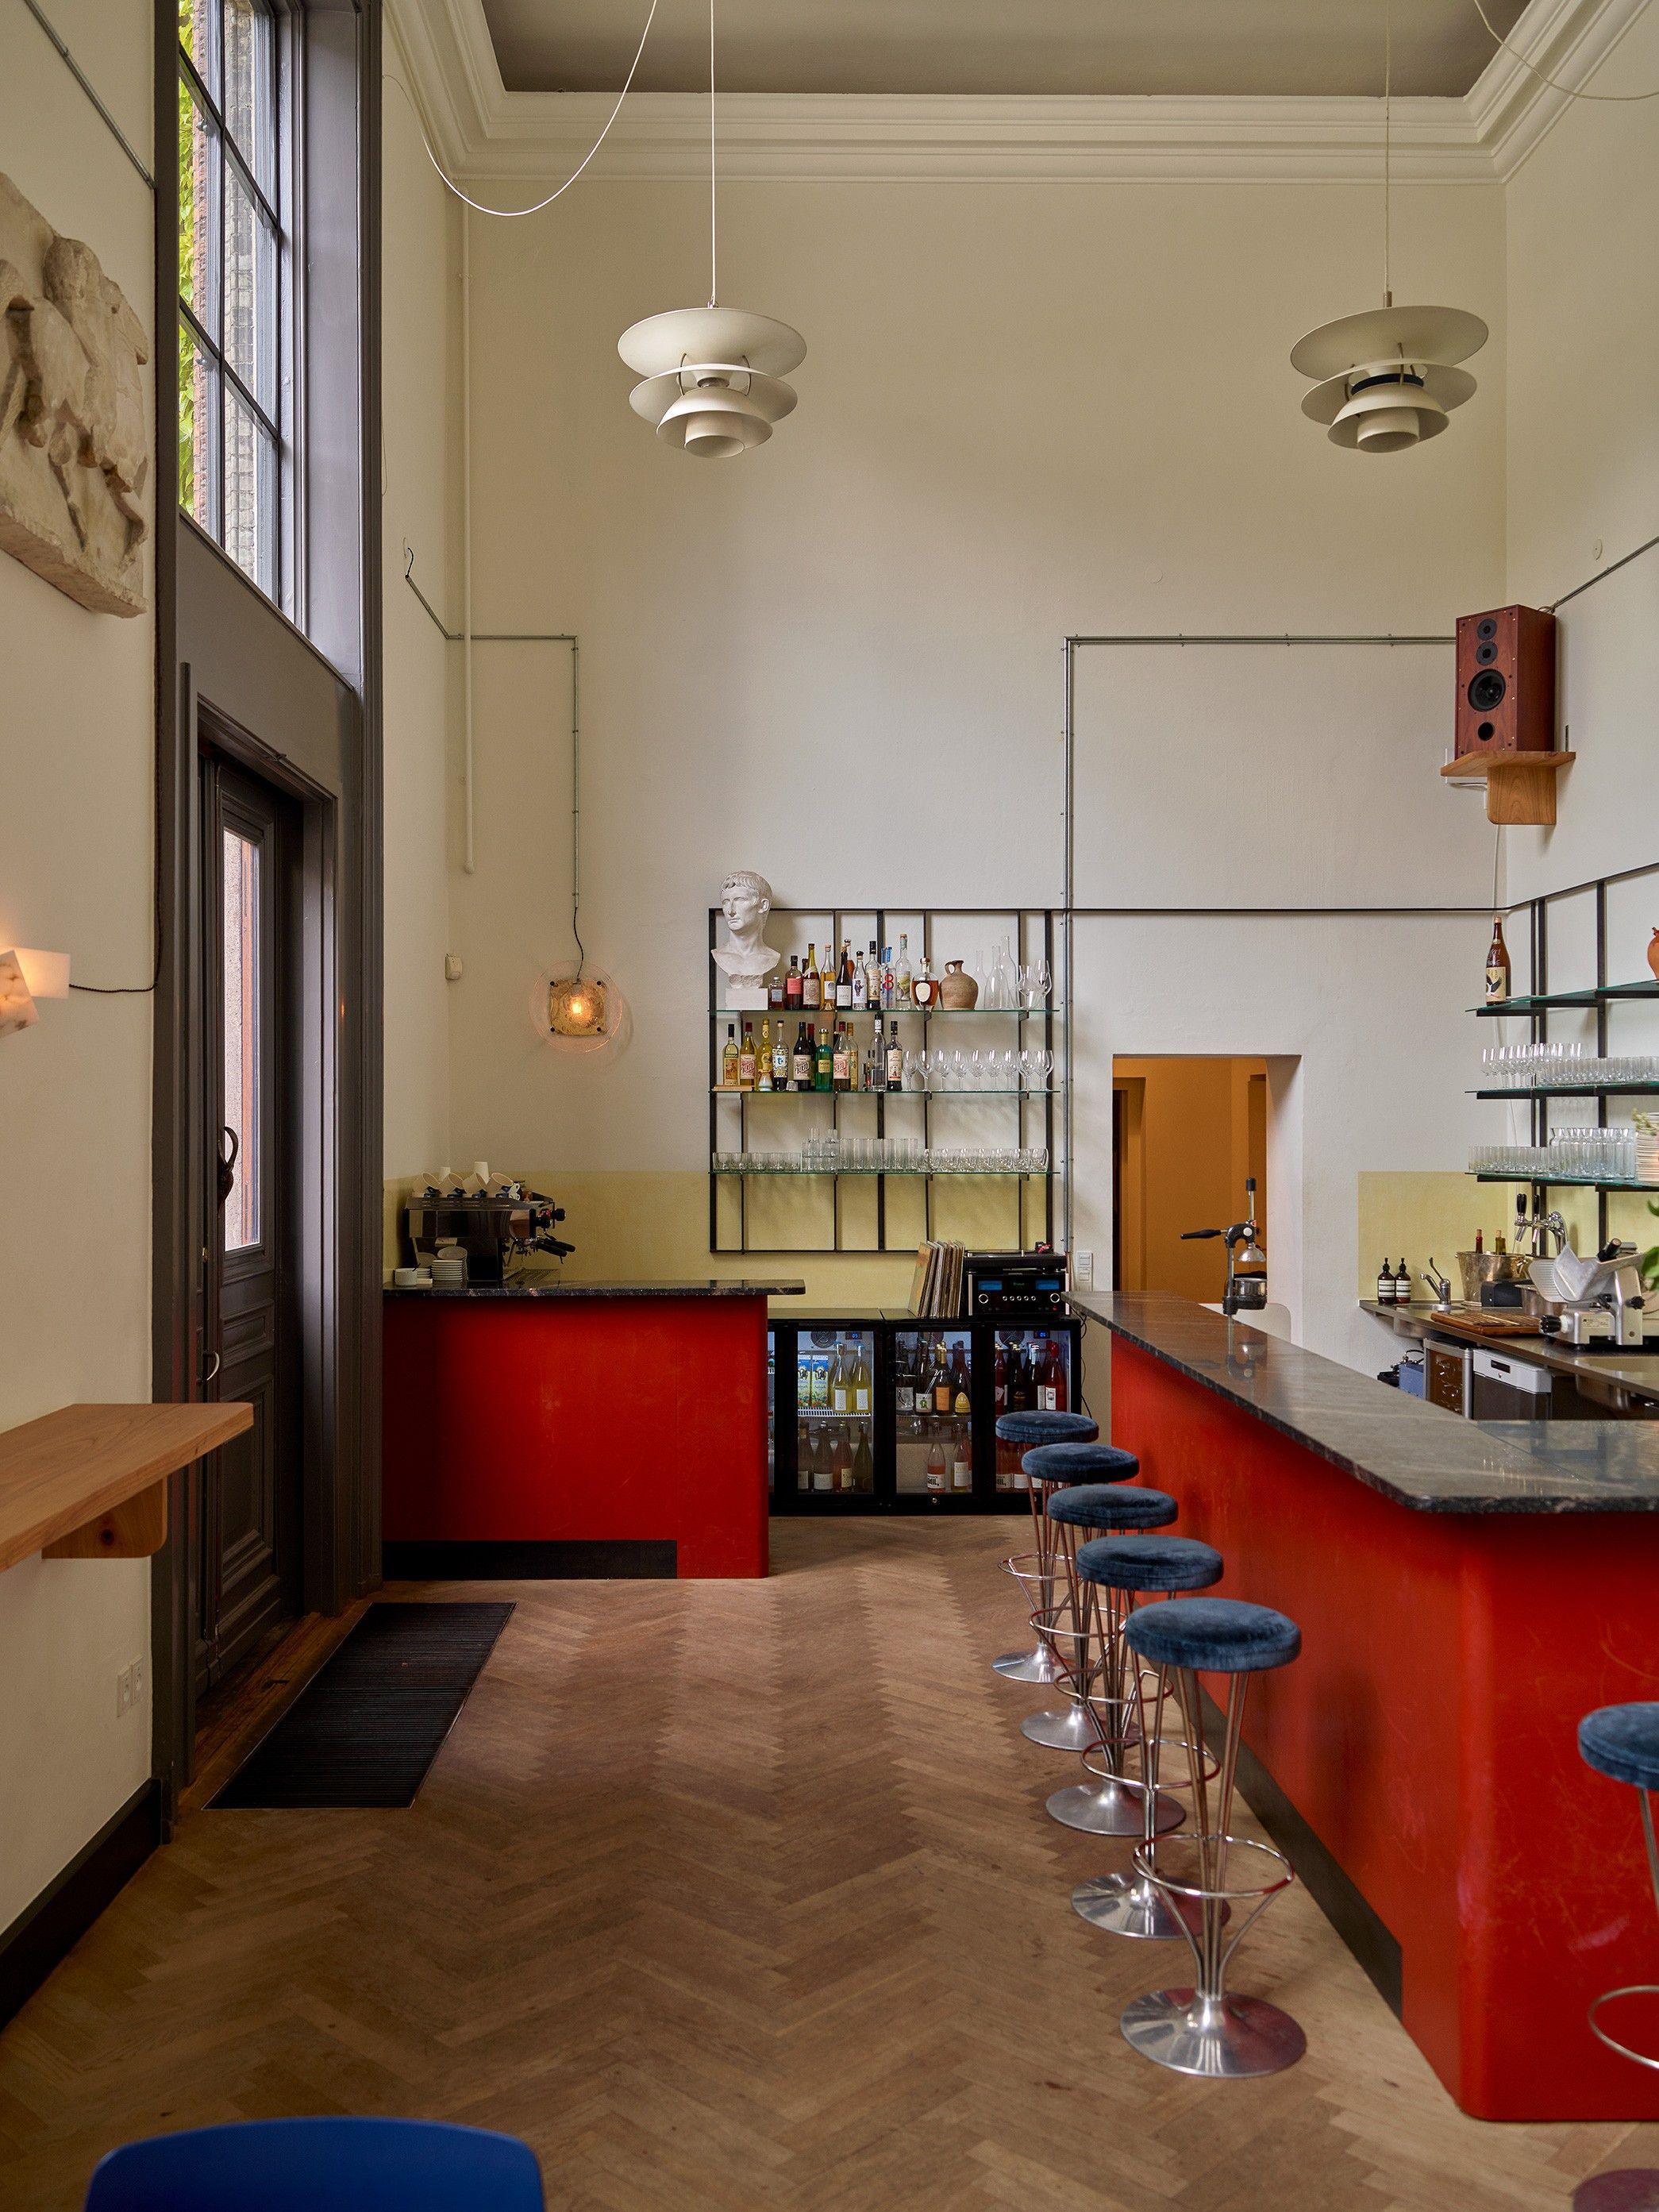 Reinventing the museum café apollo bar kantine in copenhagen remodelista